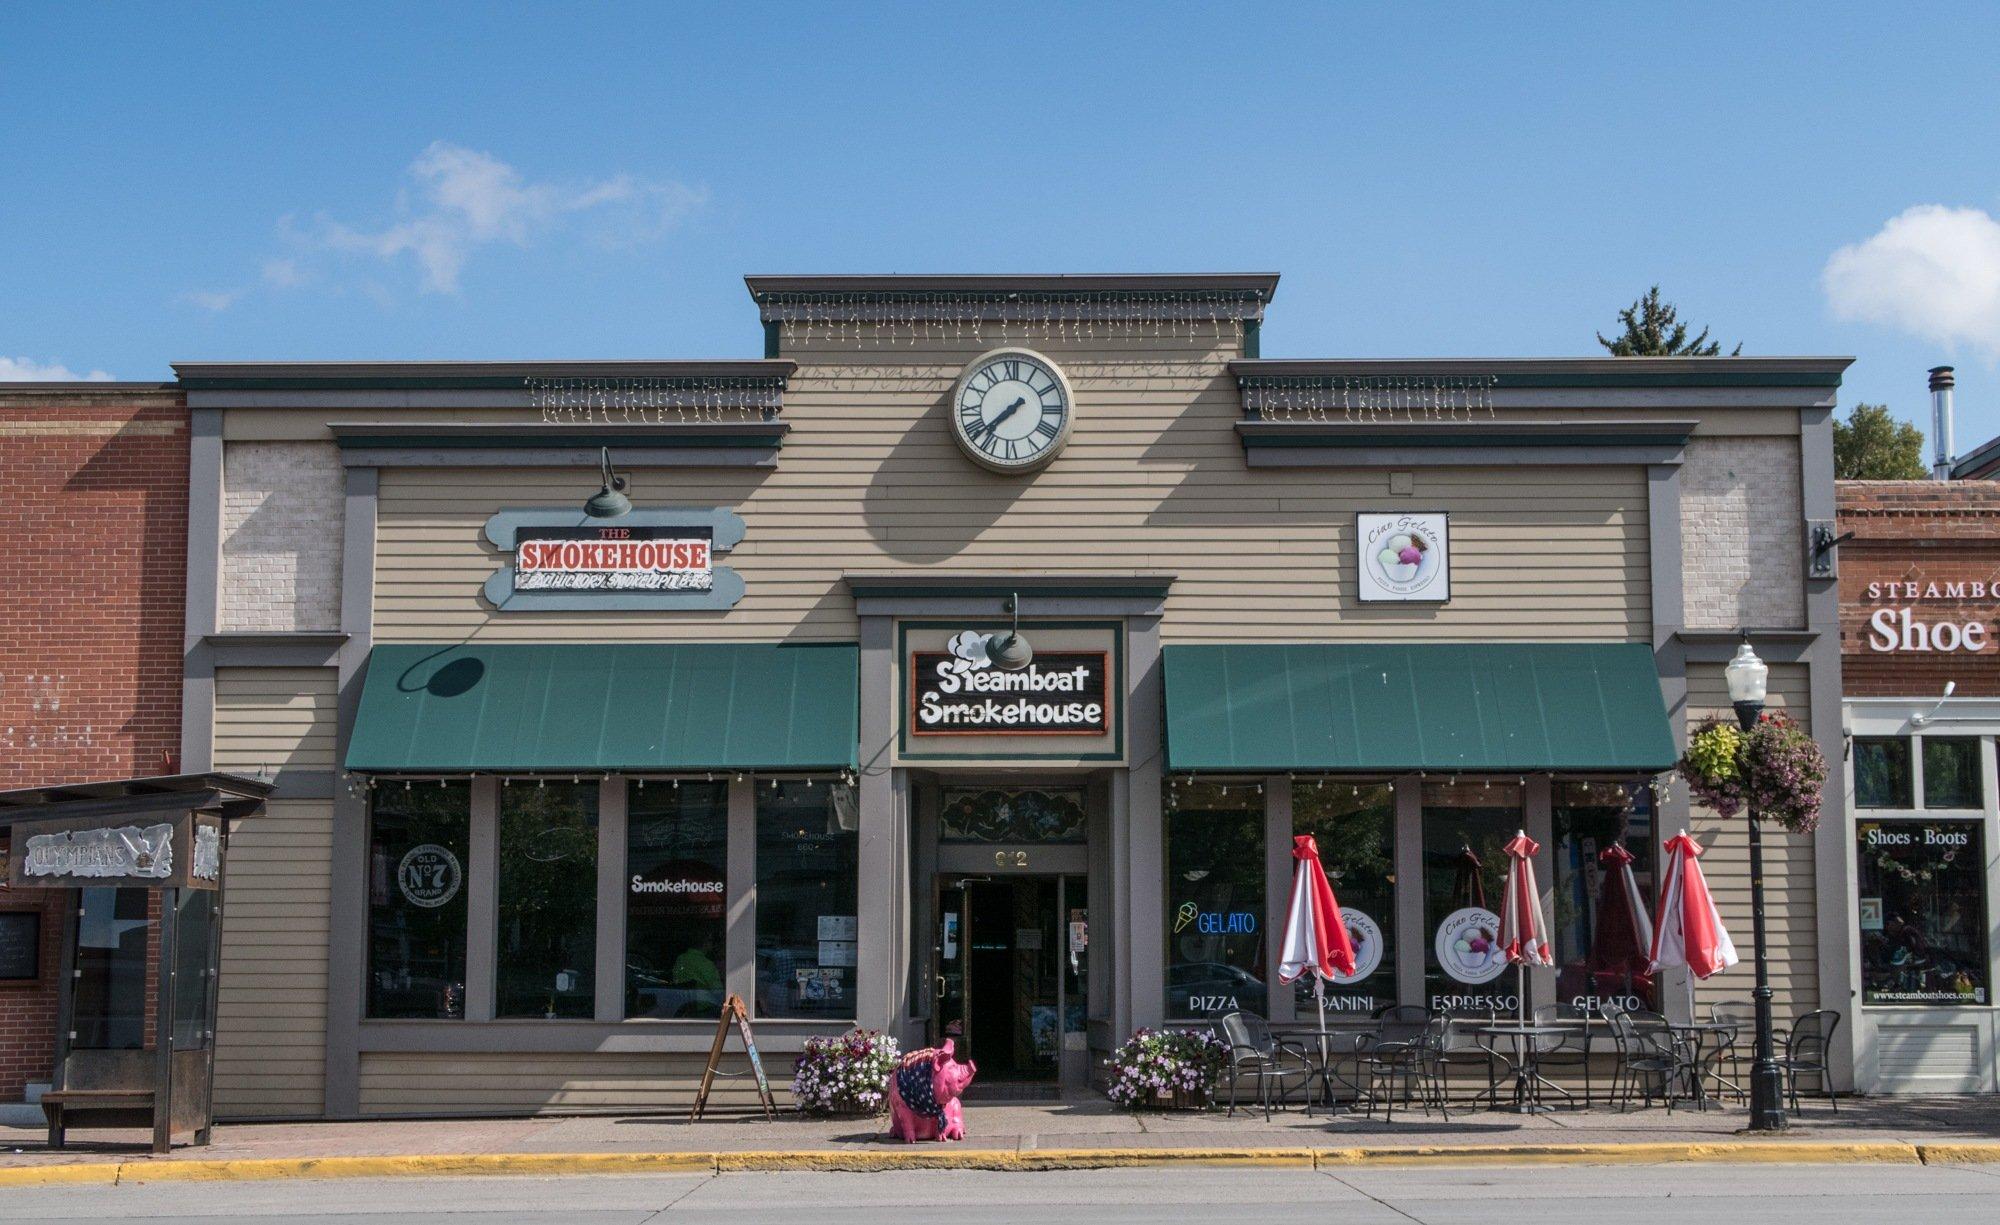 Steamboat Smokehouse restaurant